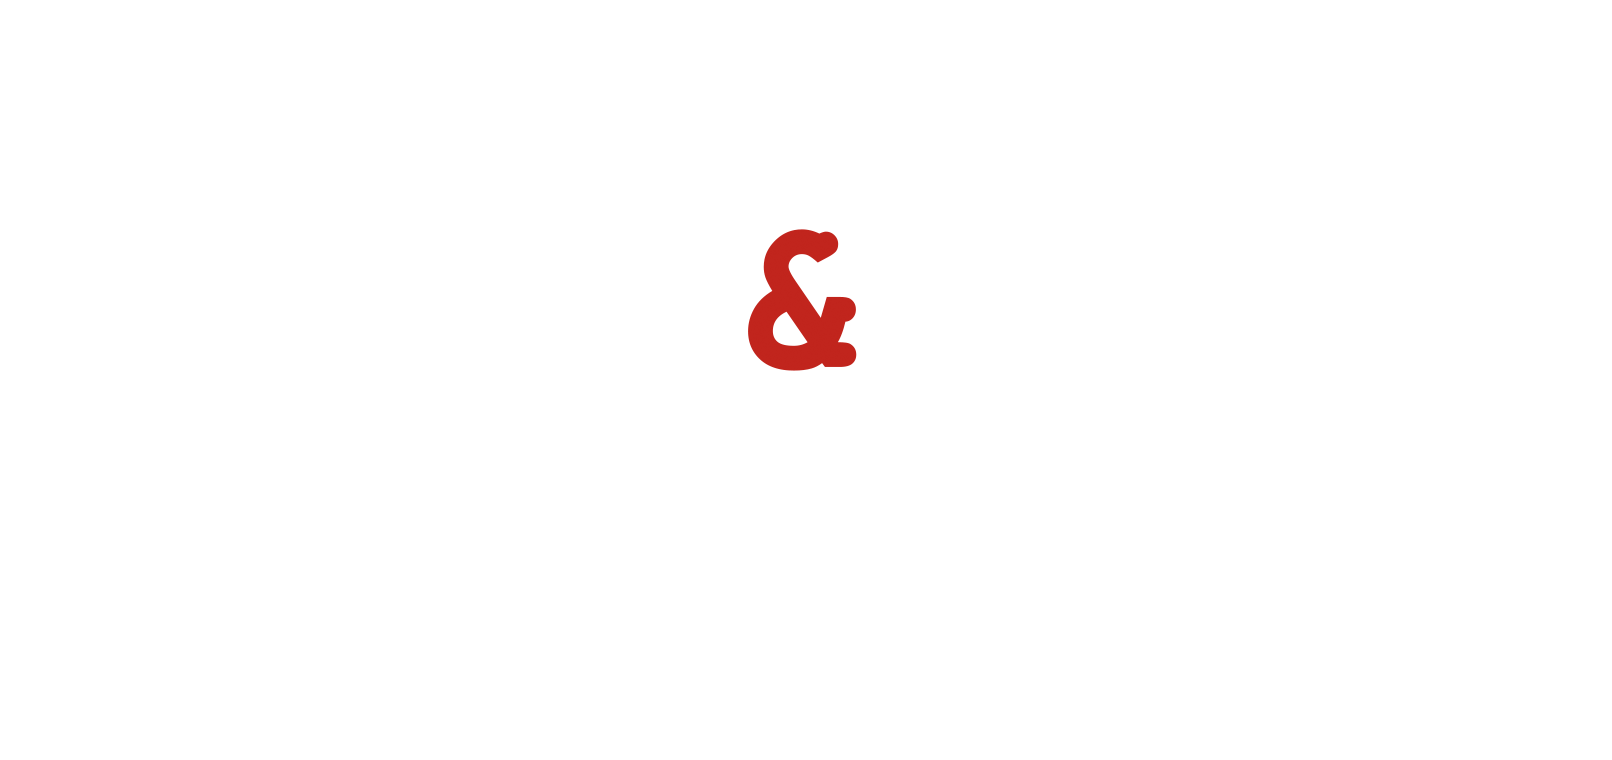 Zañartu___Zañartu_letras_blancas.png